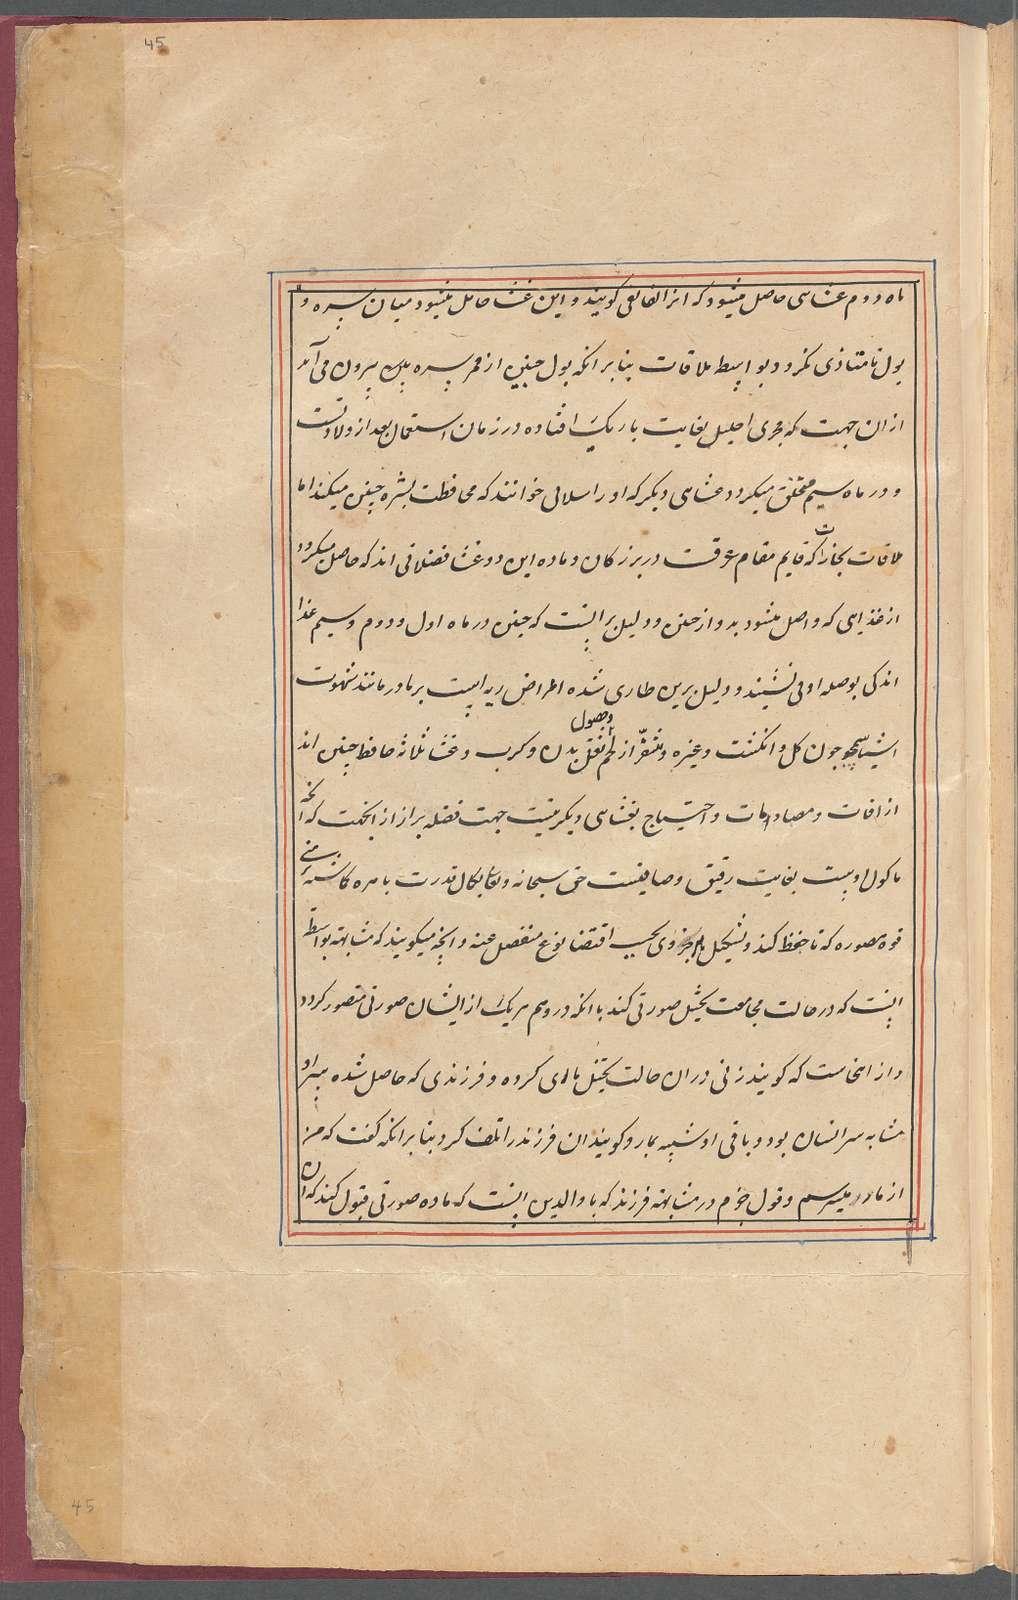 Tasrîh-i Mansûrî , fol. 45